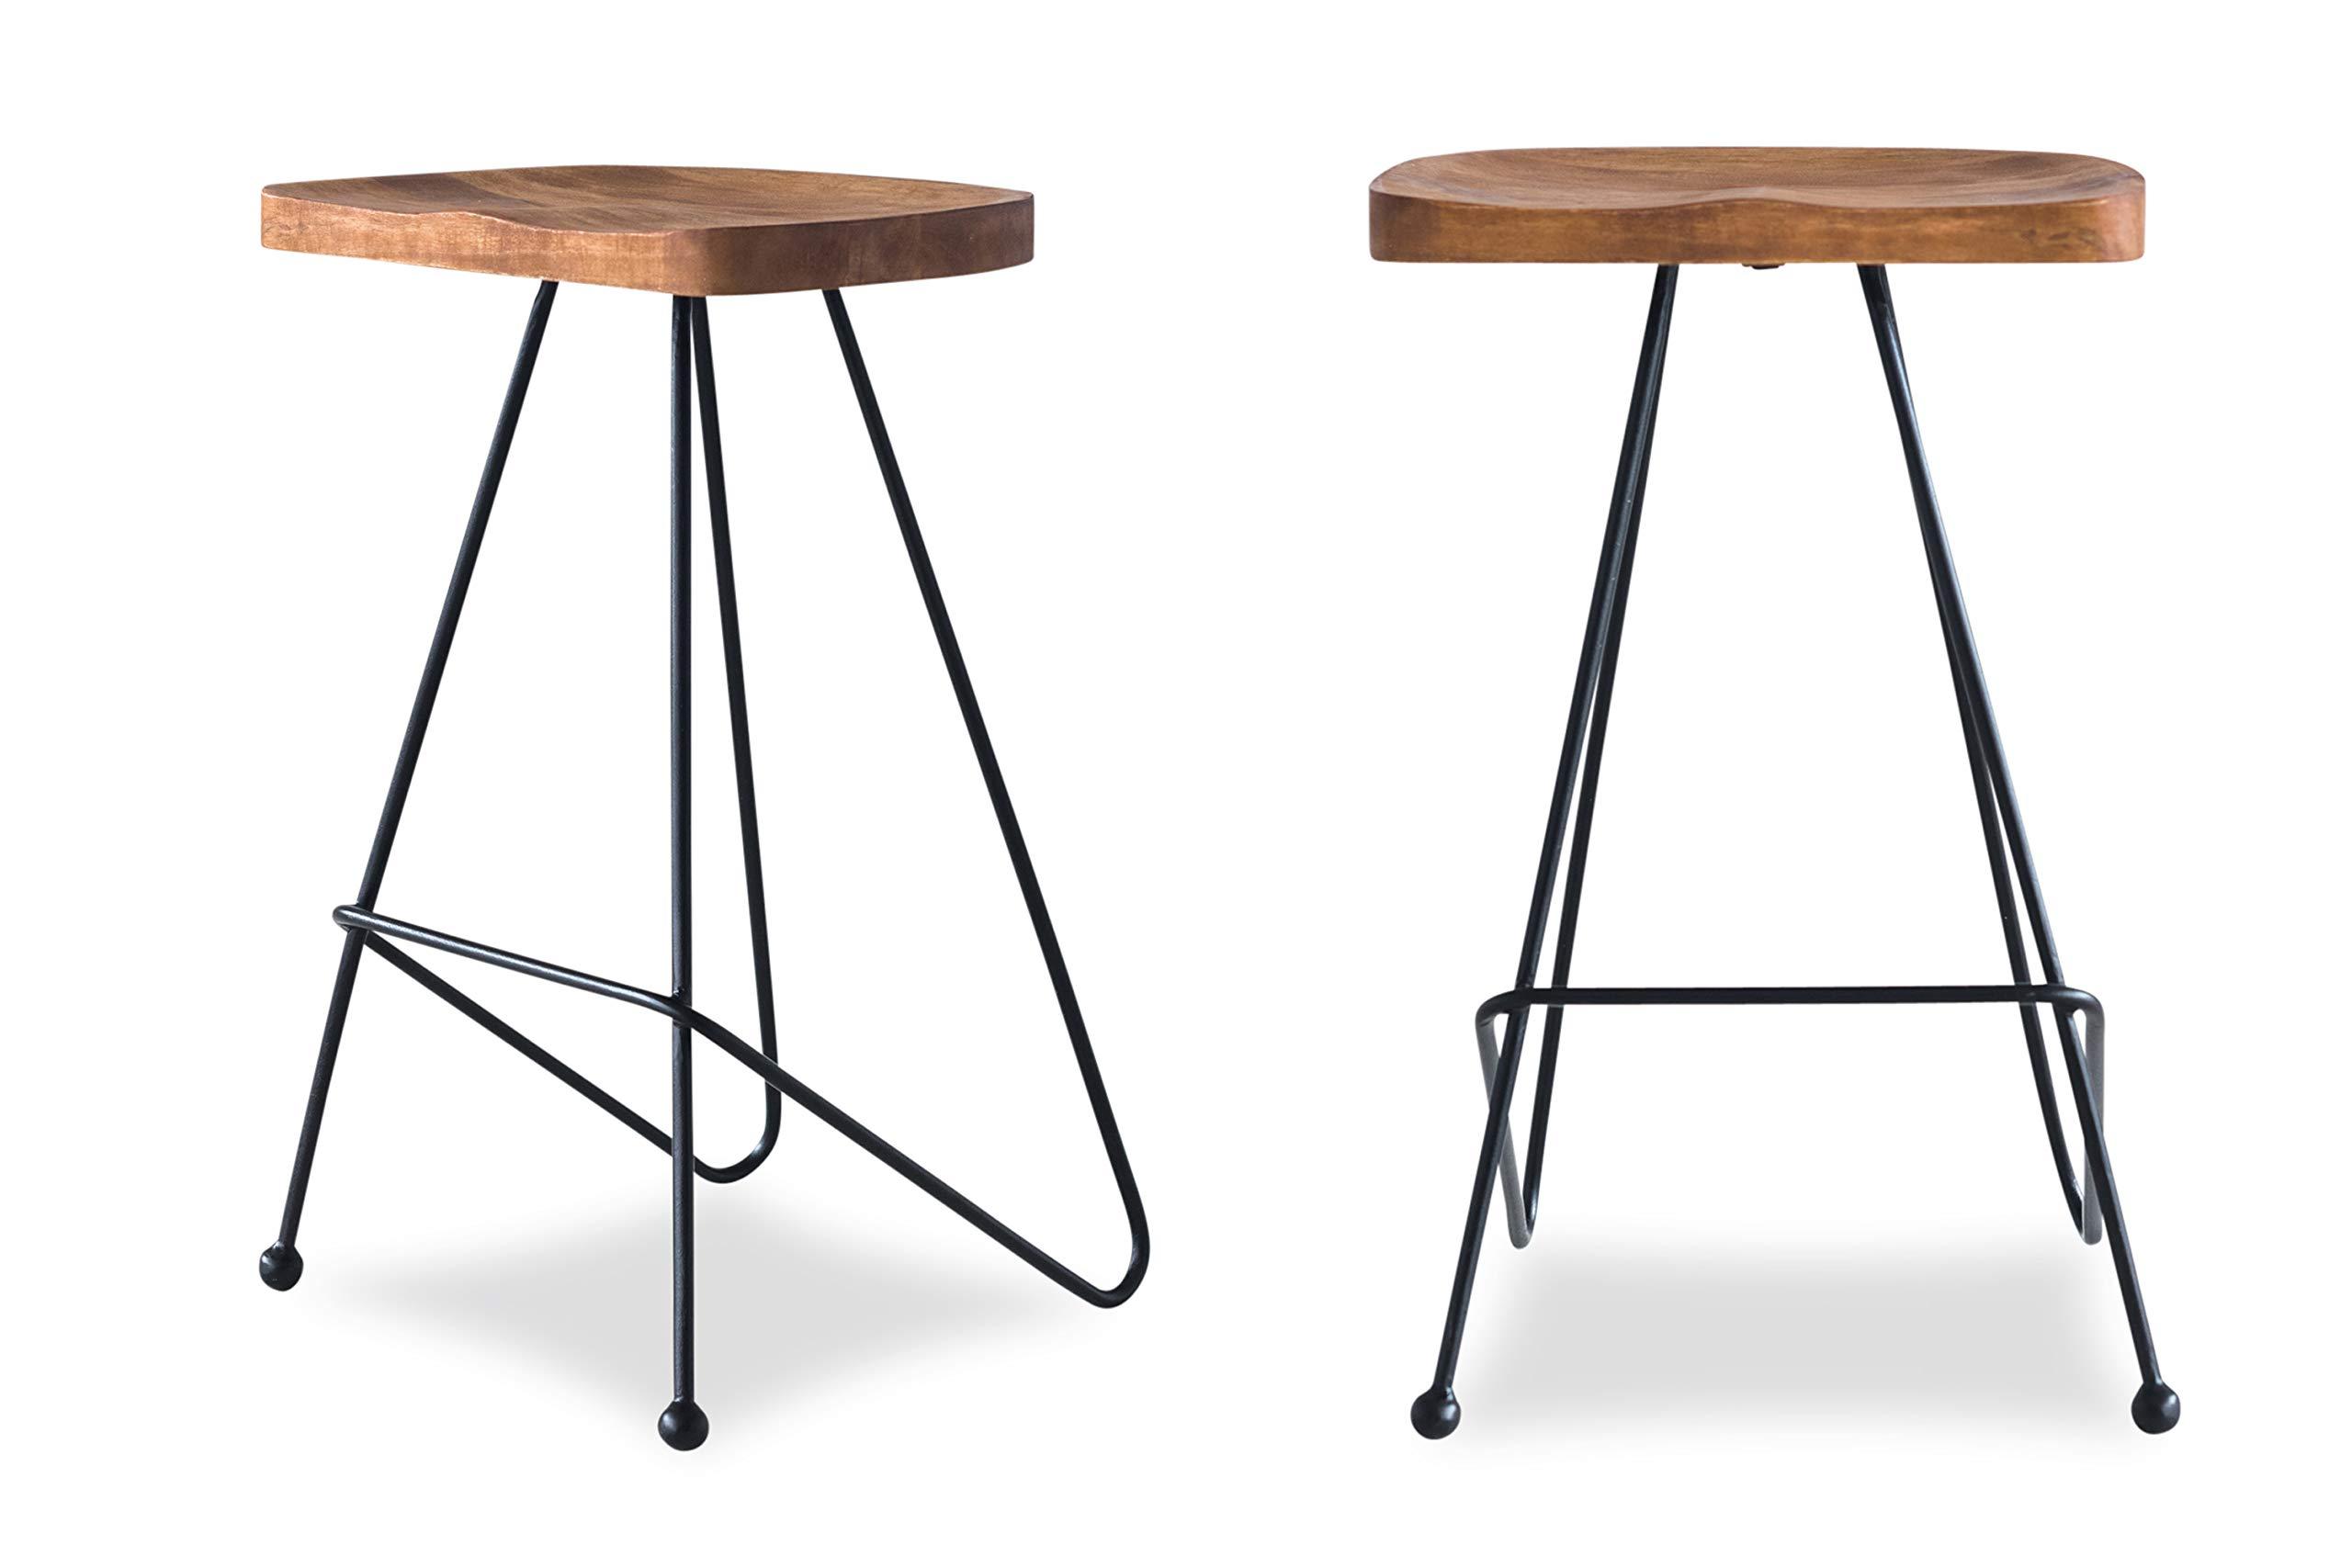 Edloe Finch ( Modern Bar Counter Stools Chairs Iron Base, Solid Sheesham Wood, Honey by Edloe Finch